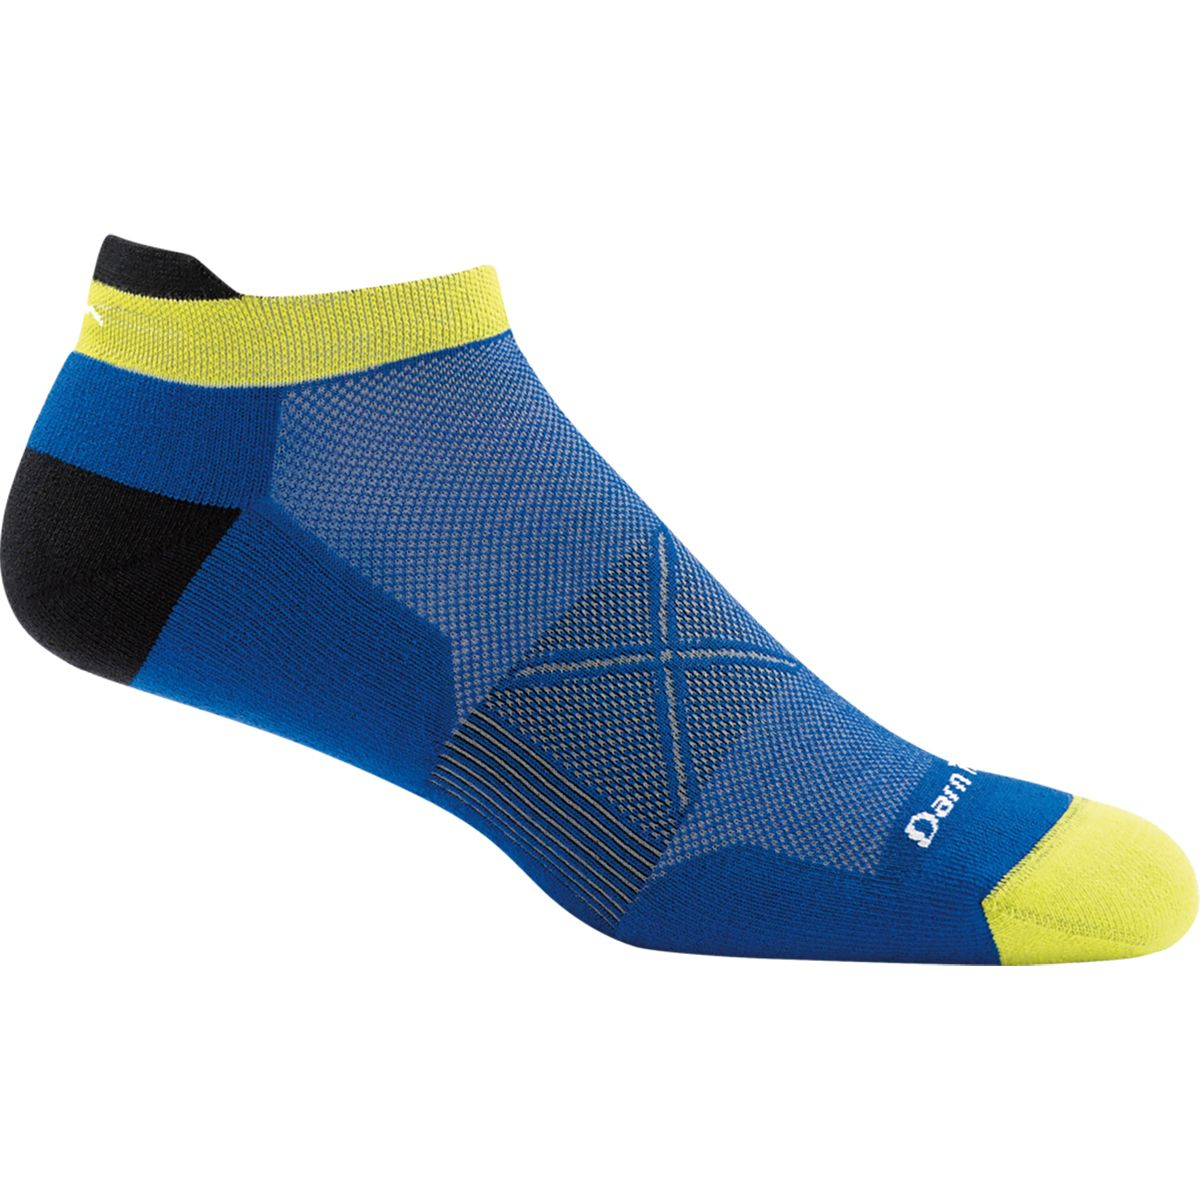 Small Darn Tough women's no show Vertex light cushion Coolmax running sock